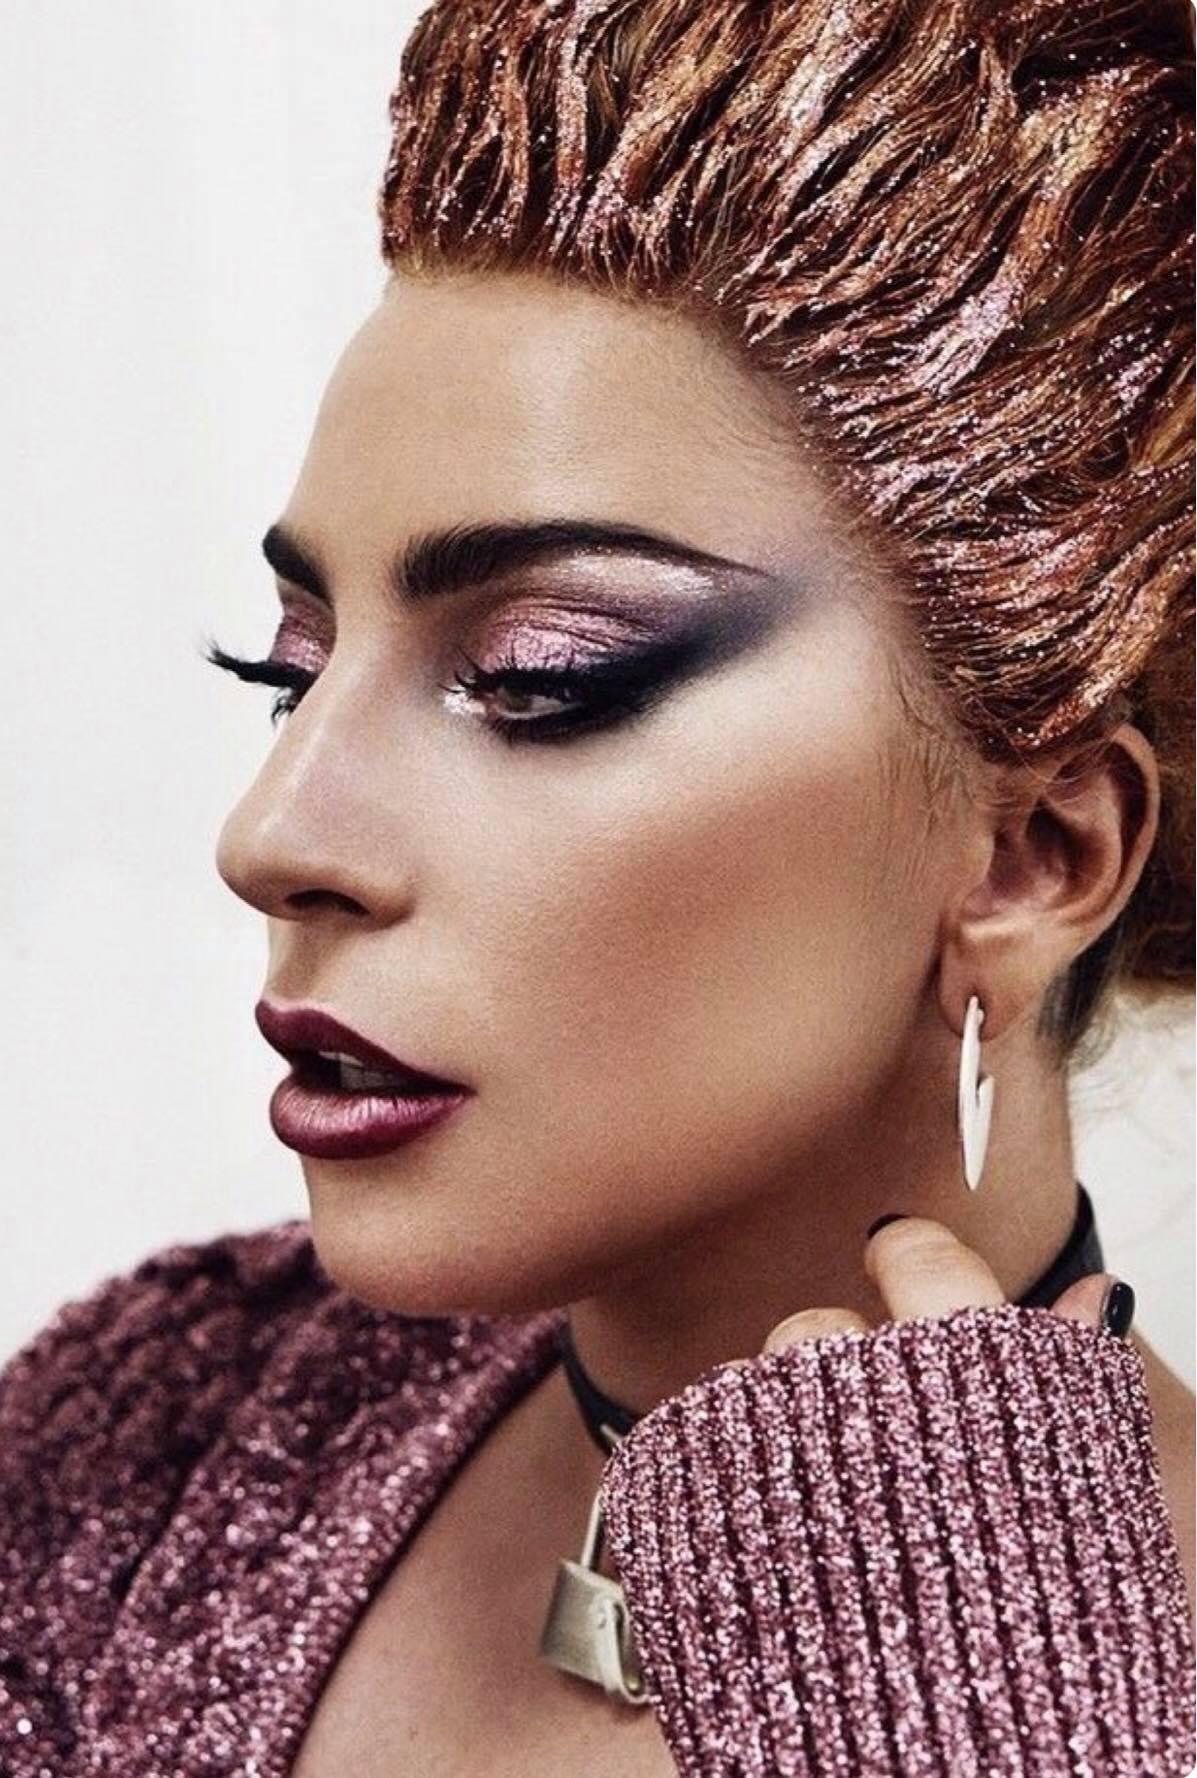 Striking Make-Up - by https://www.instagram.com/gemmahowellmakeup/